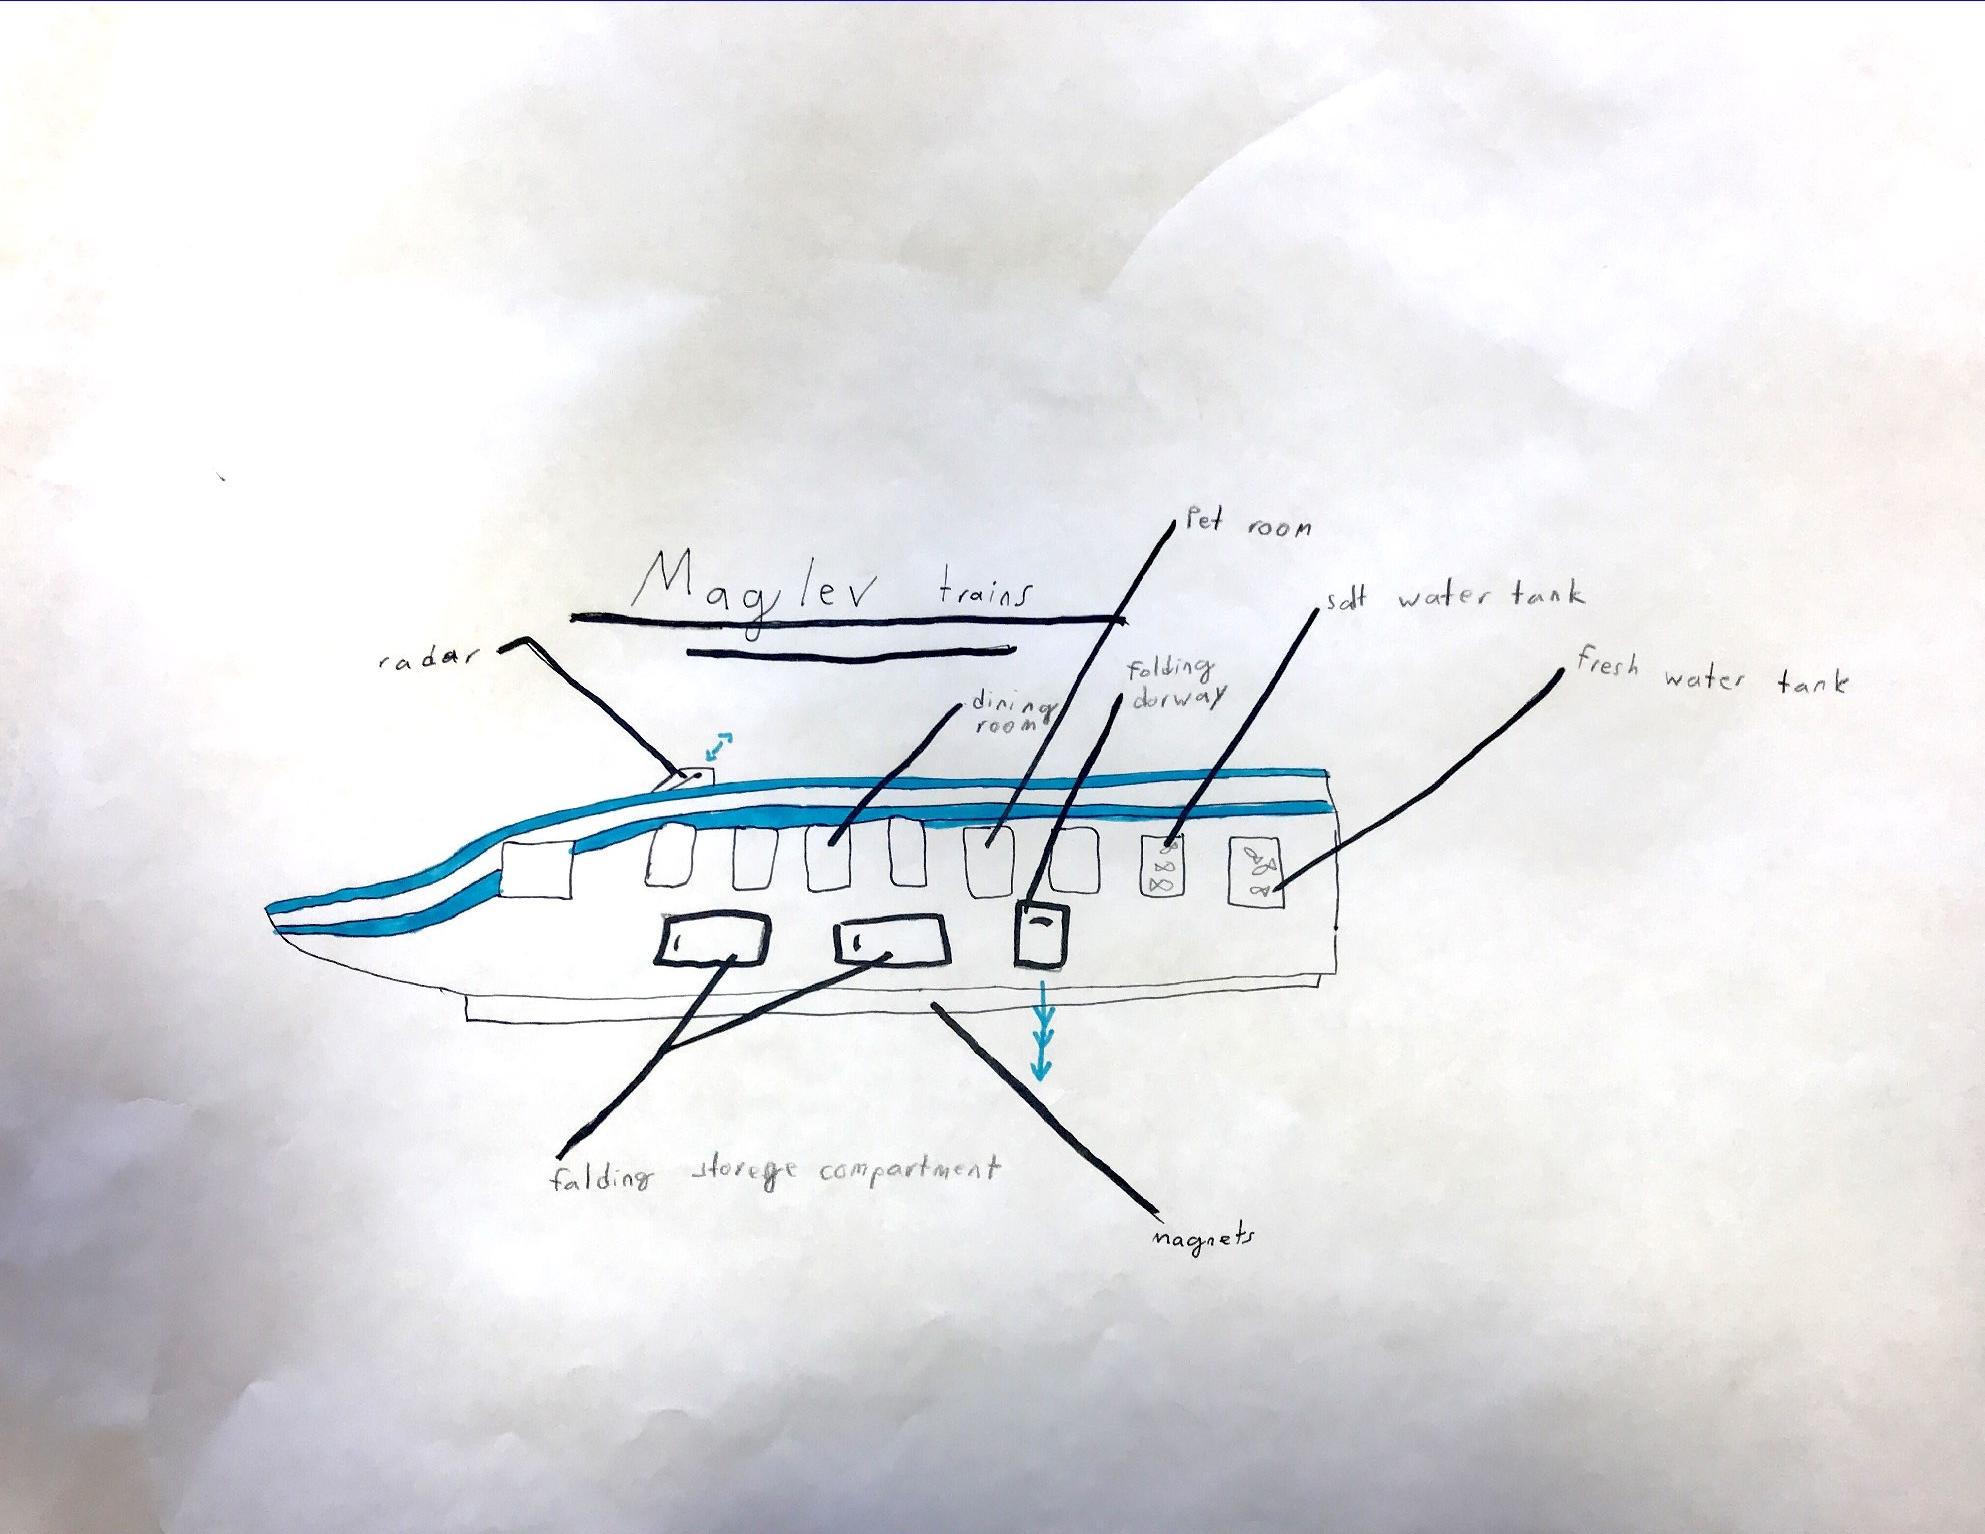 lower El innovation brainstorms-page-5.jpg